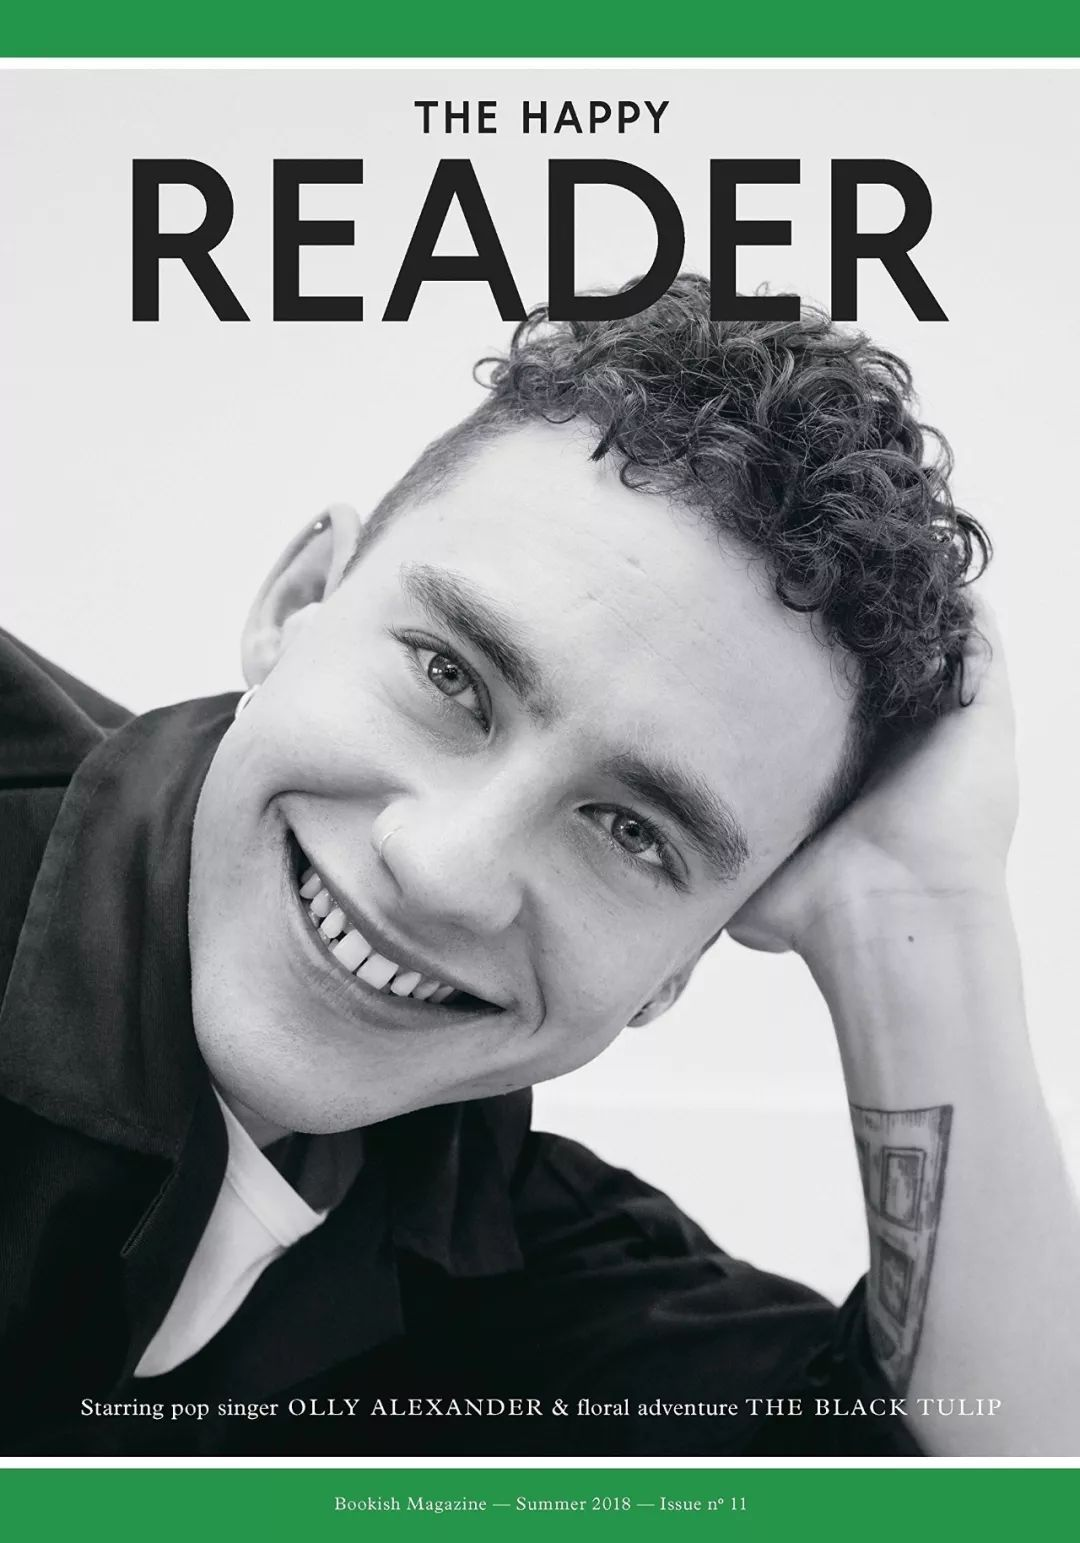 新一代Gay Icon!年年乐队主唱Olly Alexander!